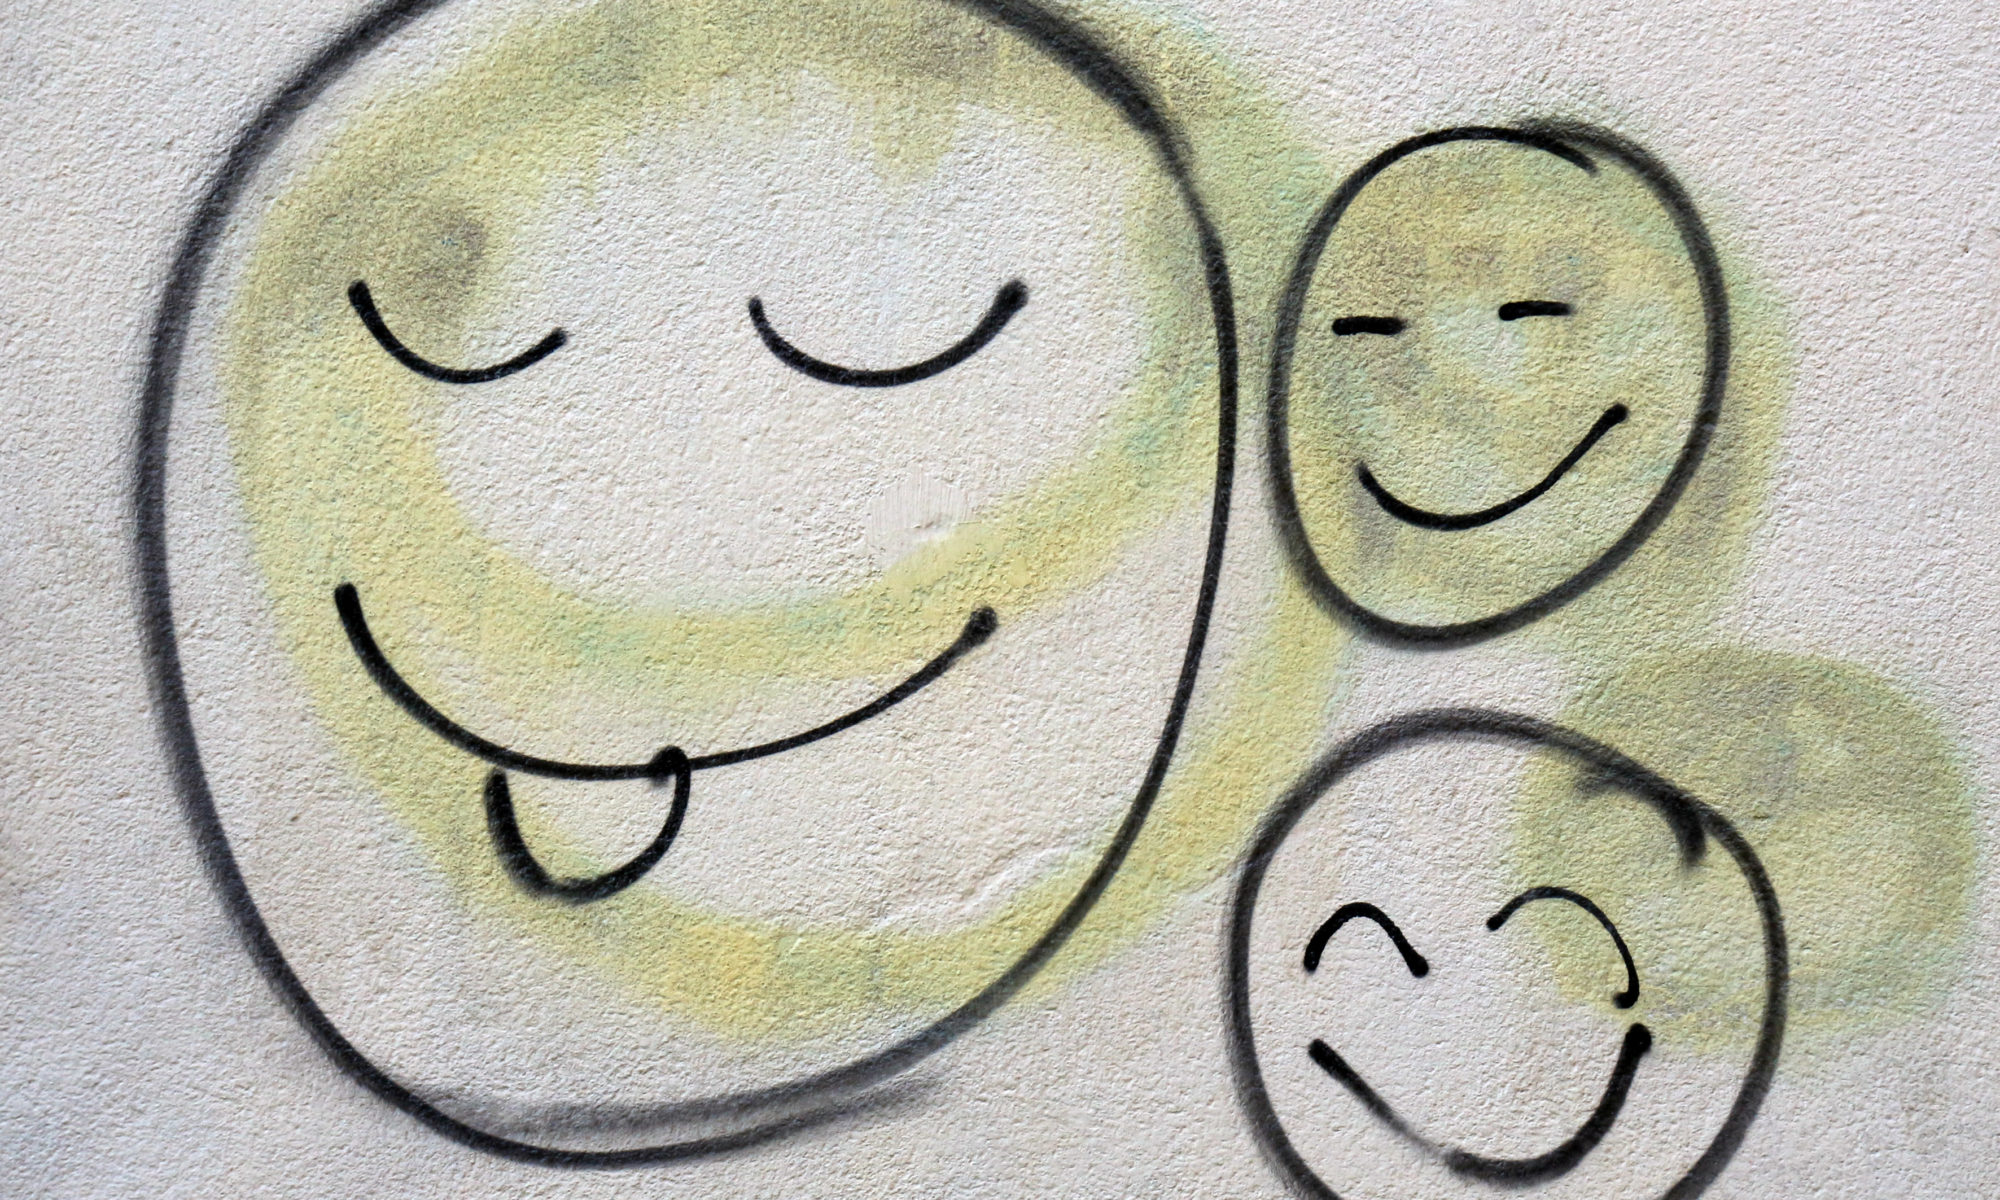 grinsende_smileys_by_peter_weidemann_pfarrbriefservice